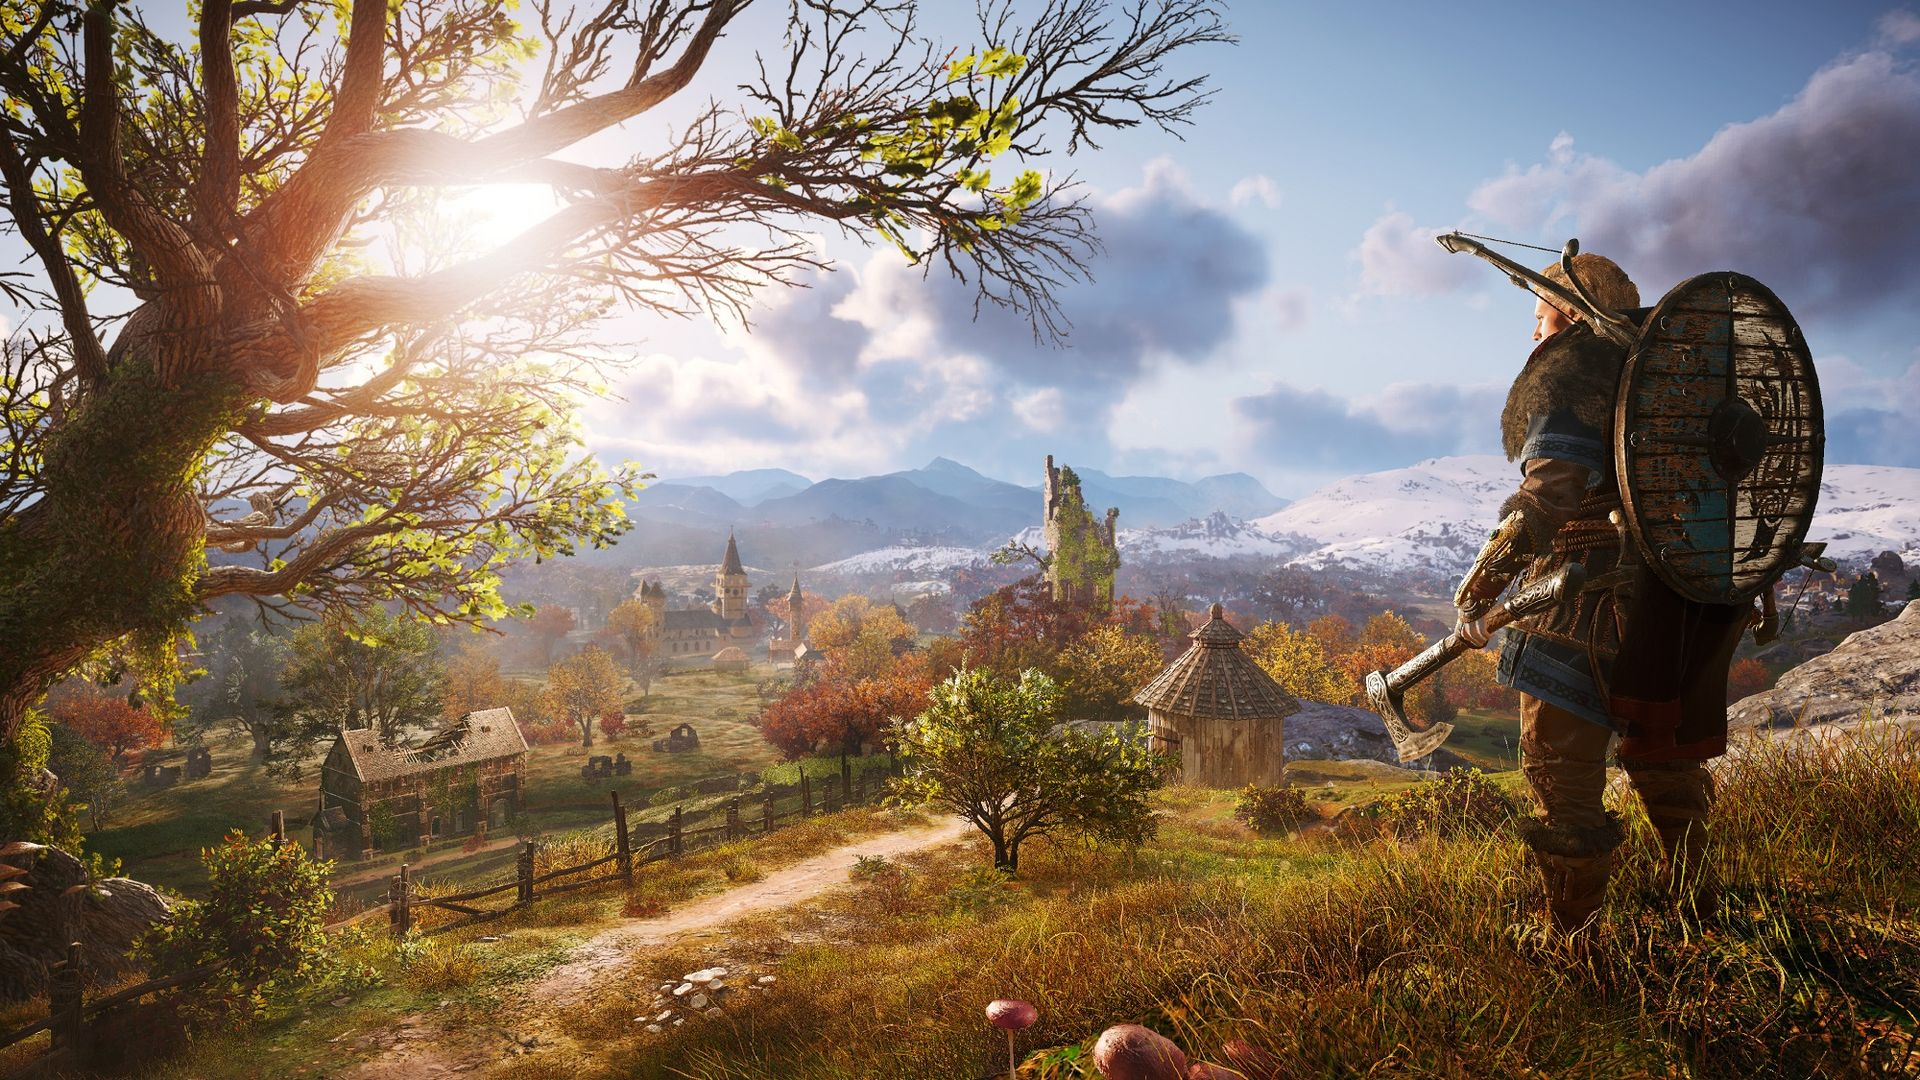 Assassin's Creed: Valhalla ger oss mer av det goda